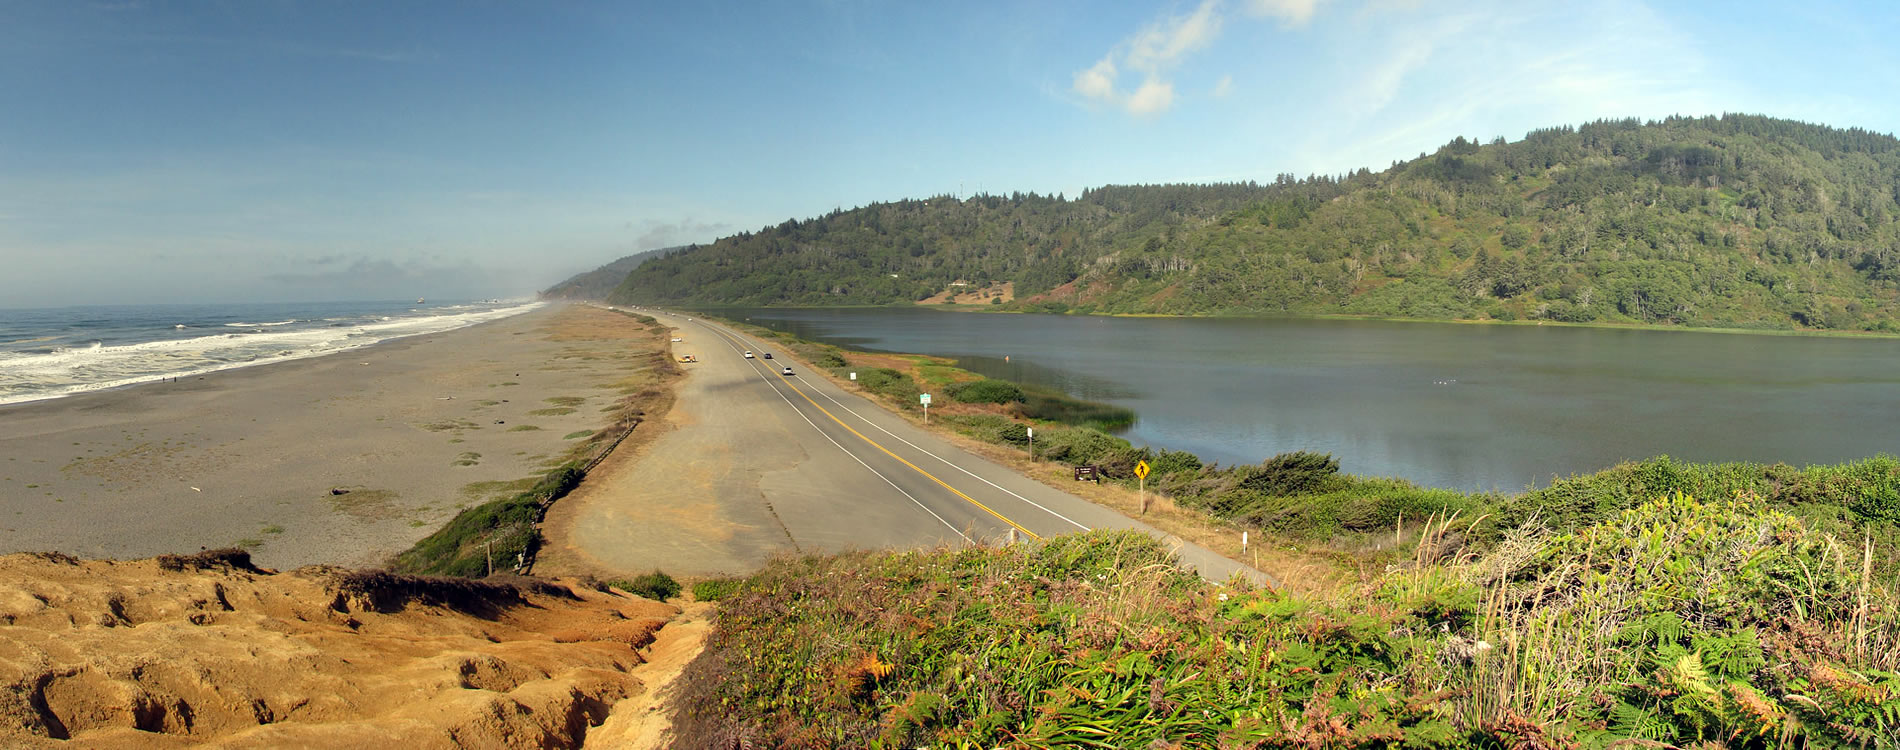 northern california coast redwood highway one